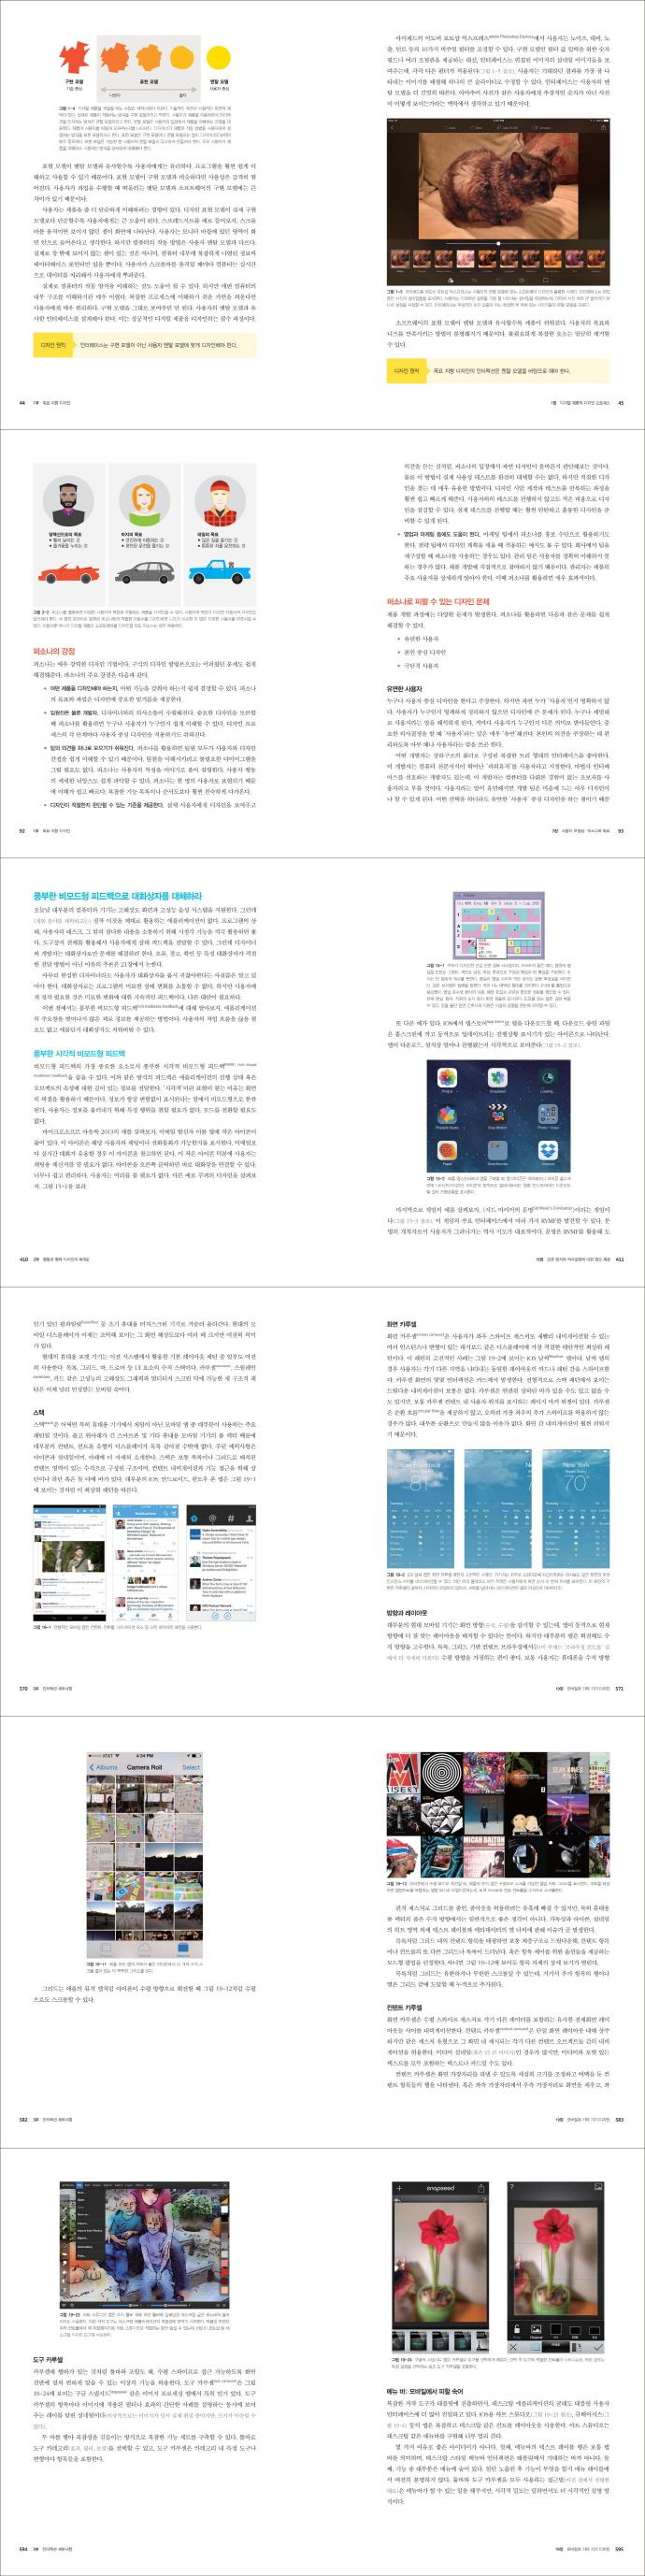 About Face 4 인터랙션 디자인의 본질(4판)(UX 프로페셔널 시리즈) 도서 상세이미지